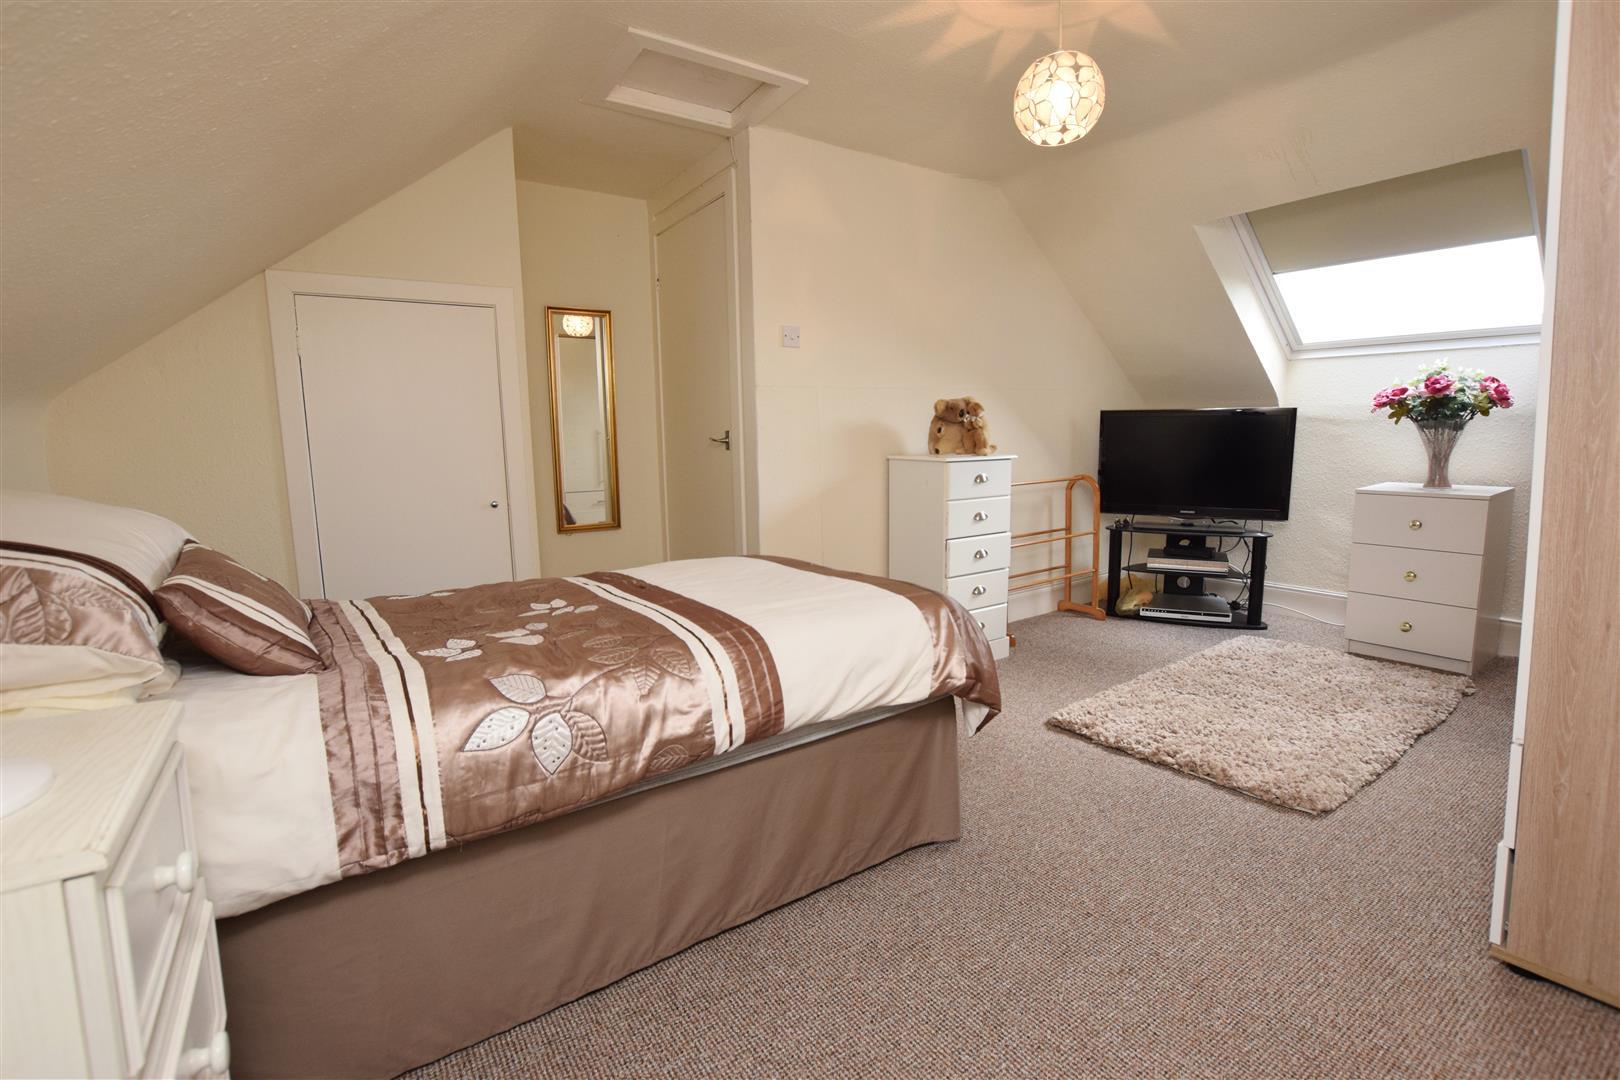 Fernlea, Croft Lane, Blairgowrie, Perthshire, PH10 6AN, UK